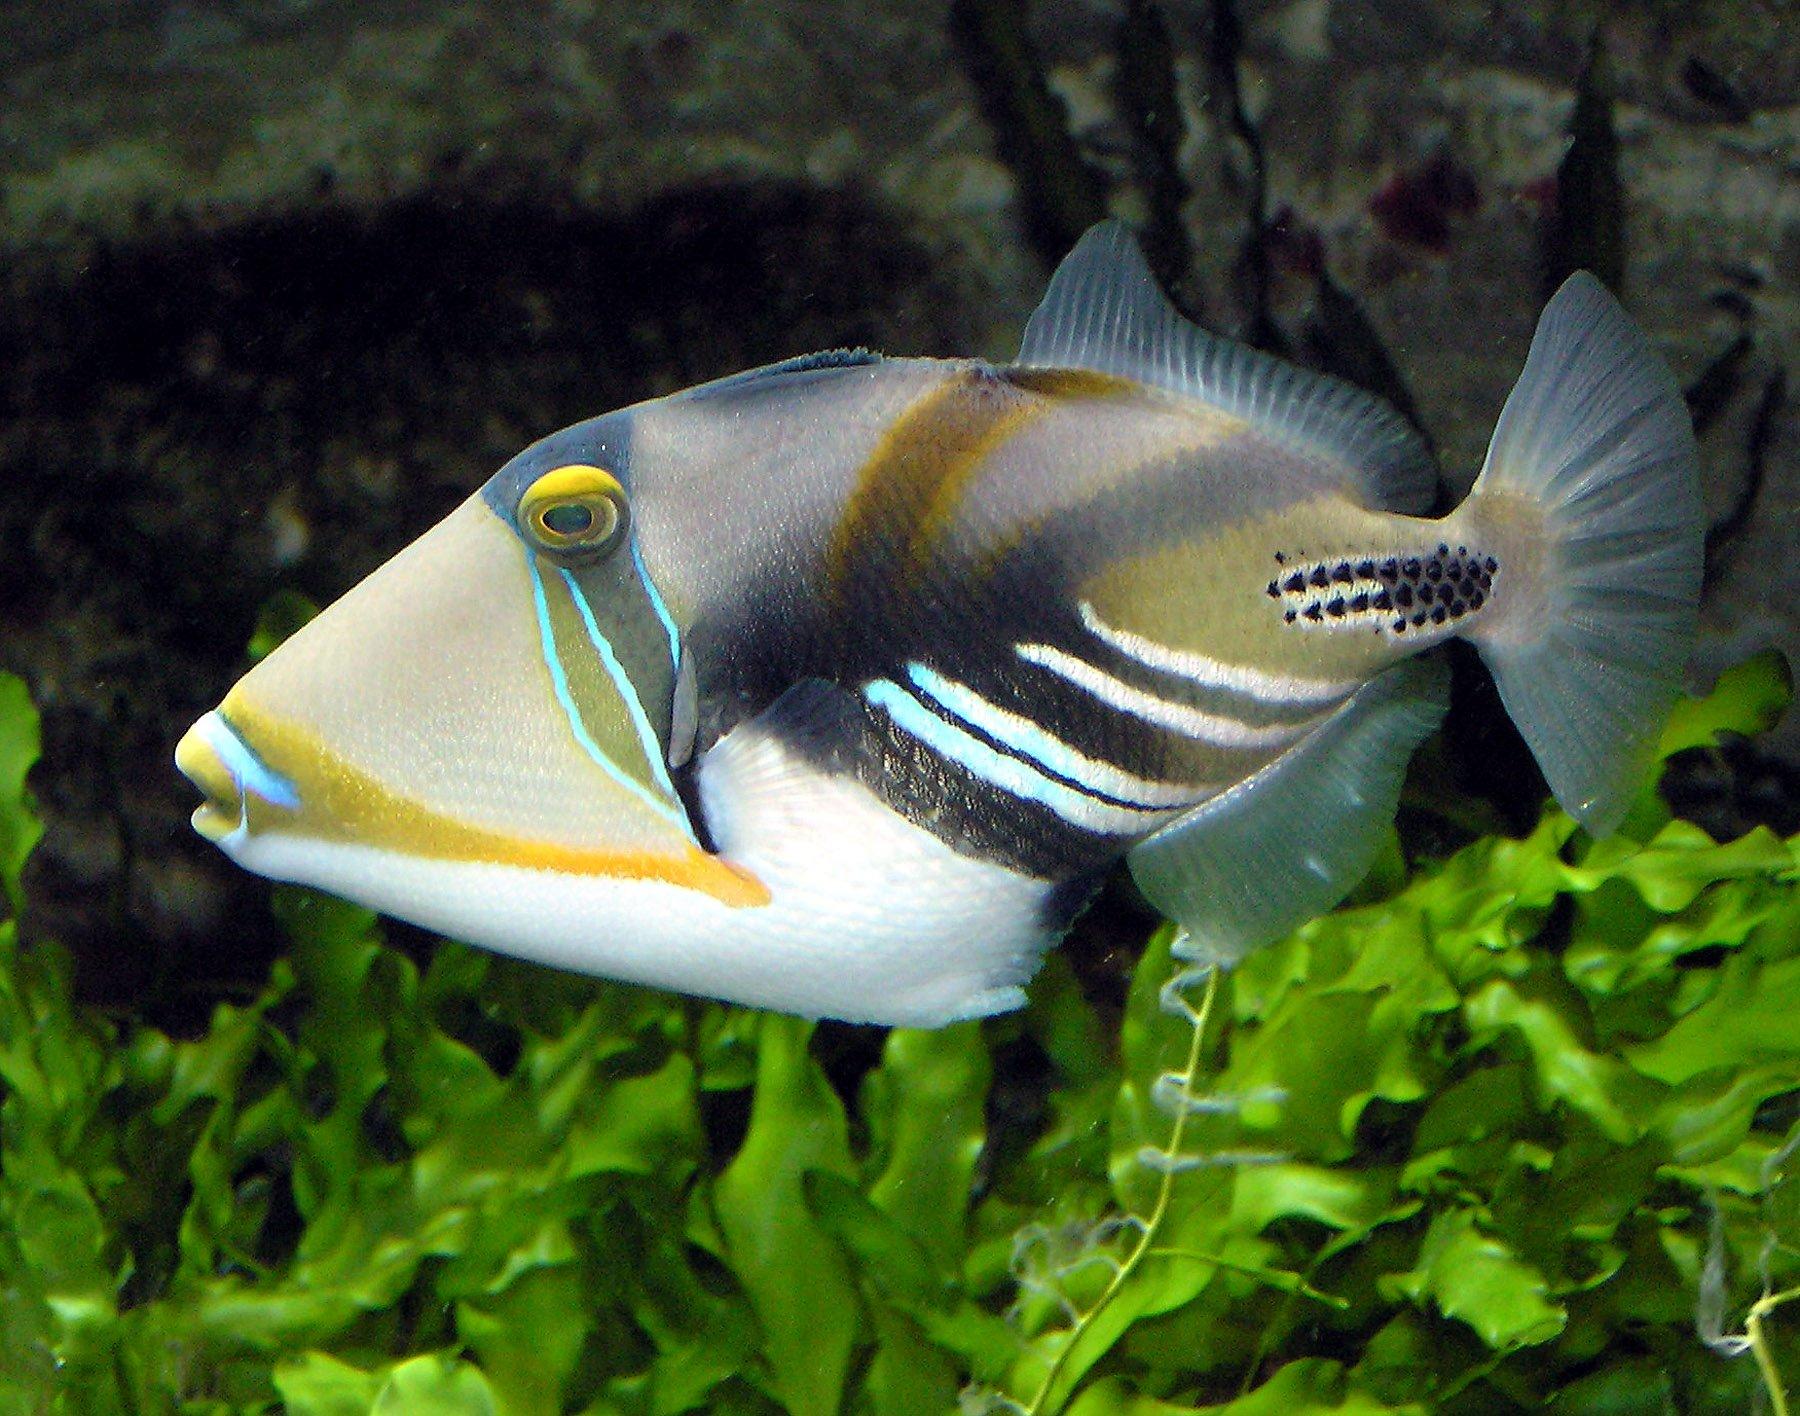 Beginner saltwater aquarium fish wallpapers download for pc Fish For 1800x1416